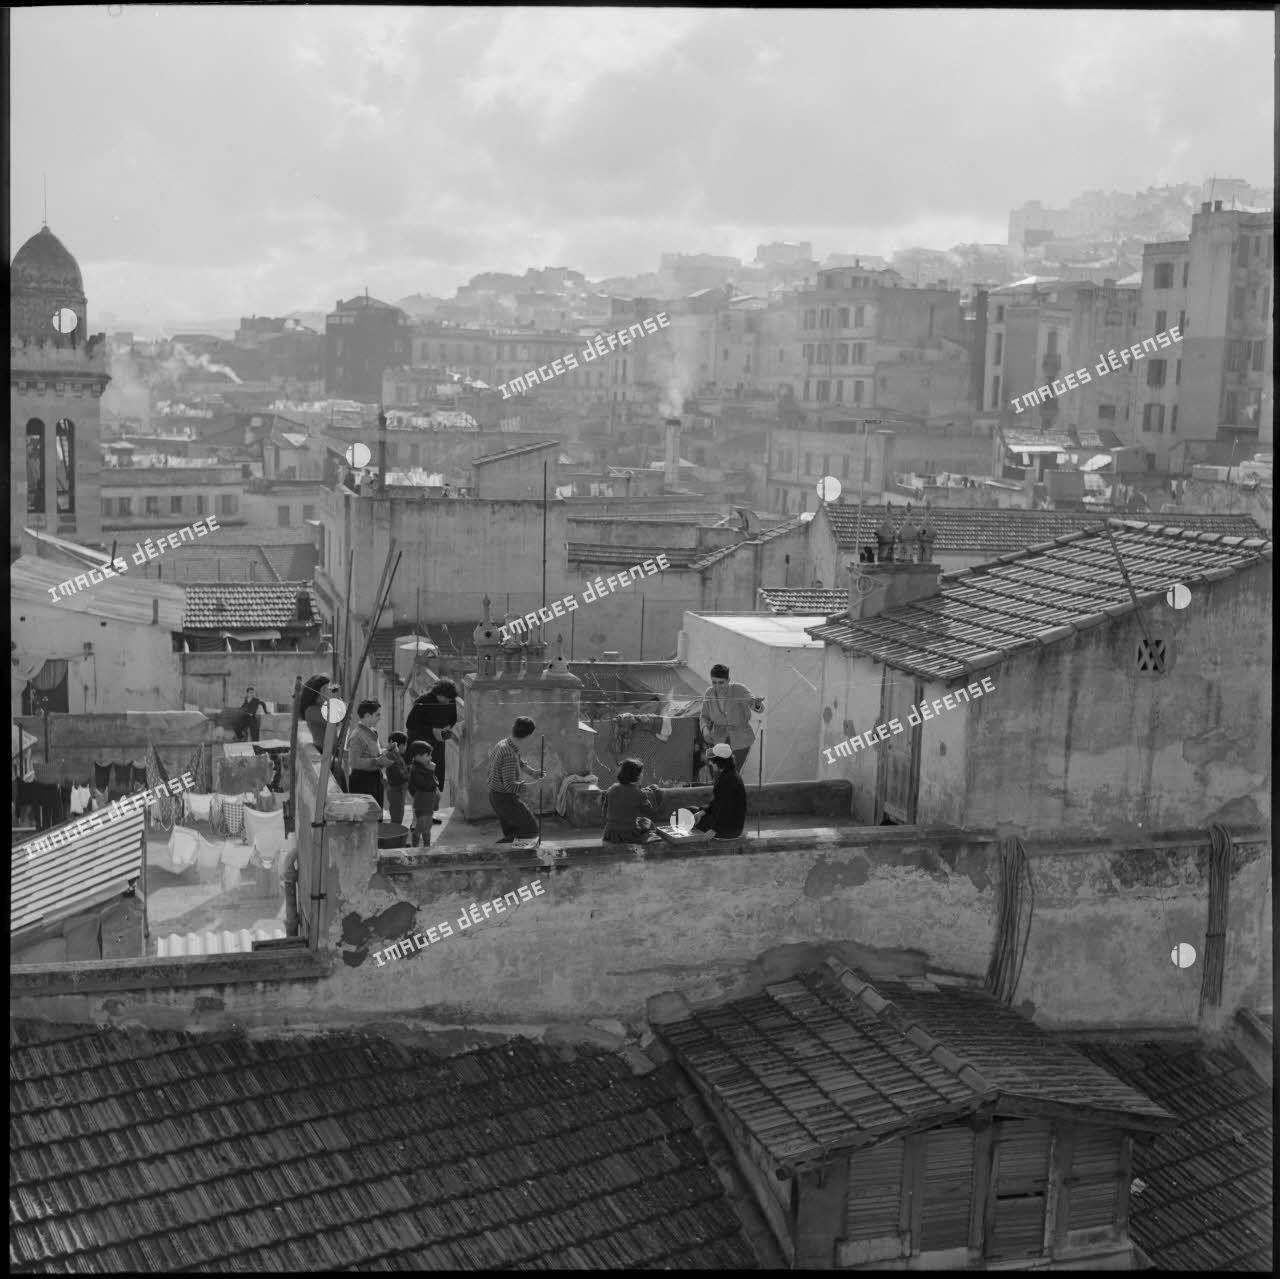 Vue de la casbah d'Alger.